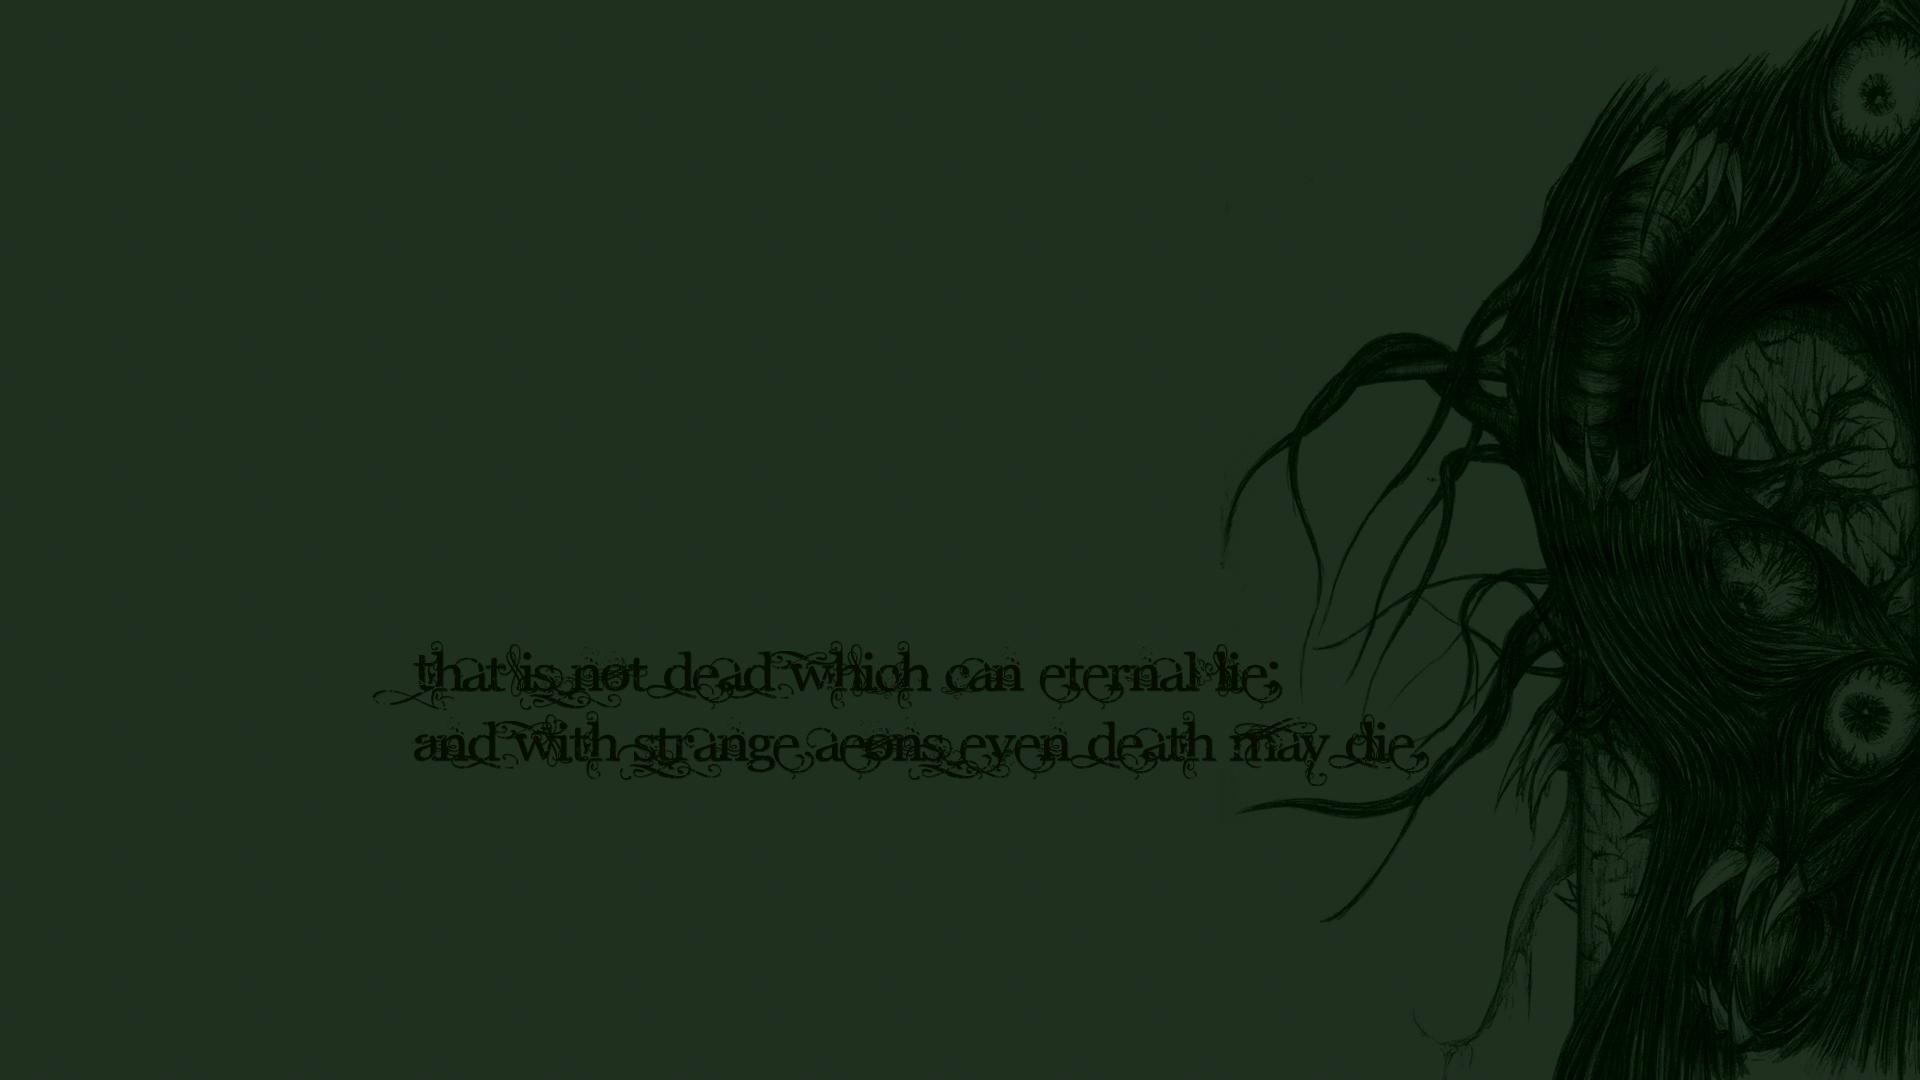 Hp Lovecraft Art Wallpapers: 10 H. P. Lovecraft HD Wallpapers